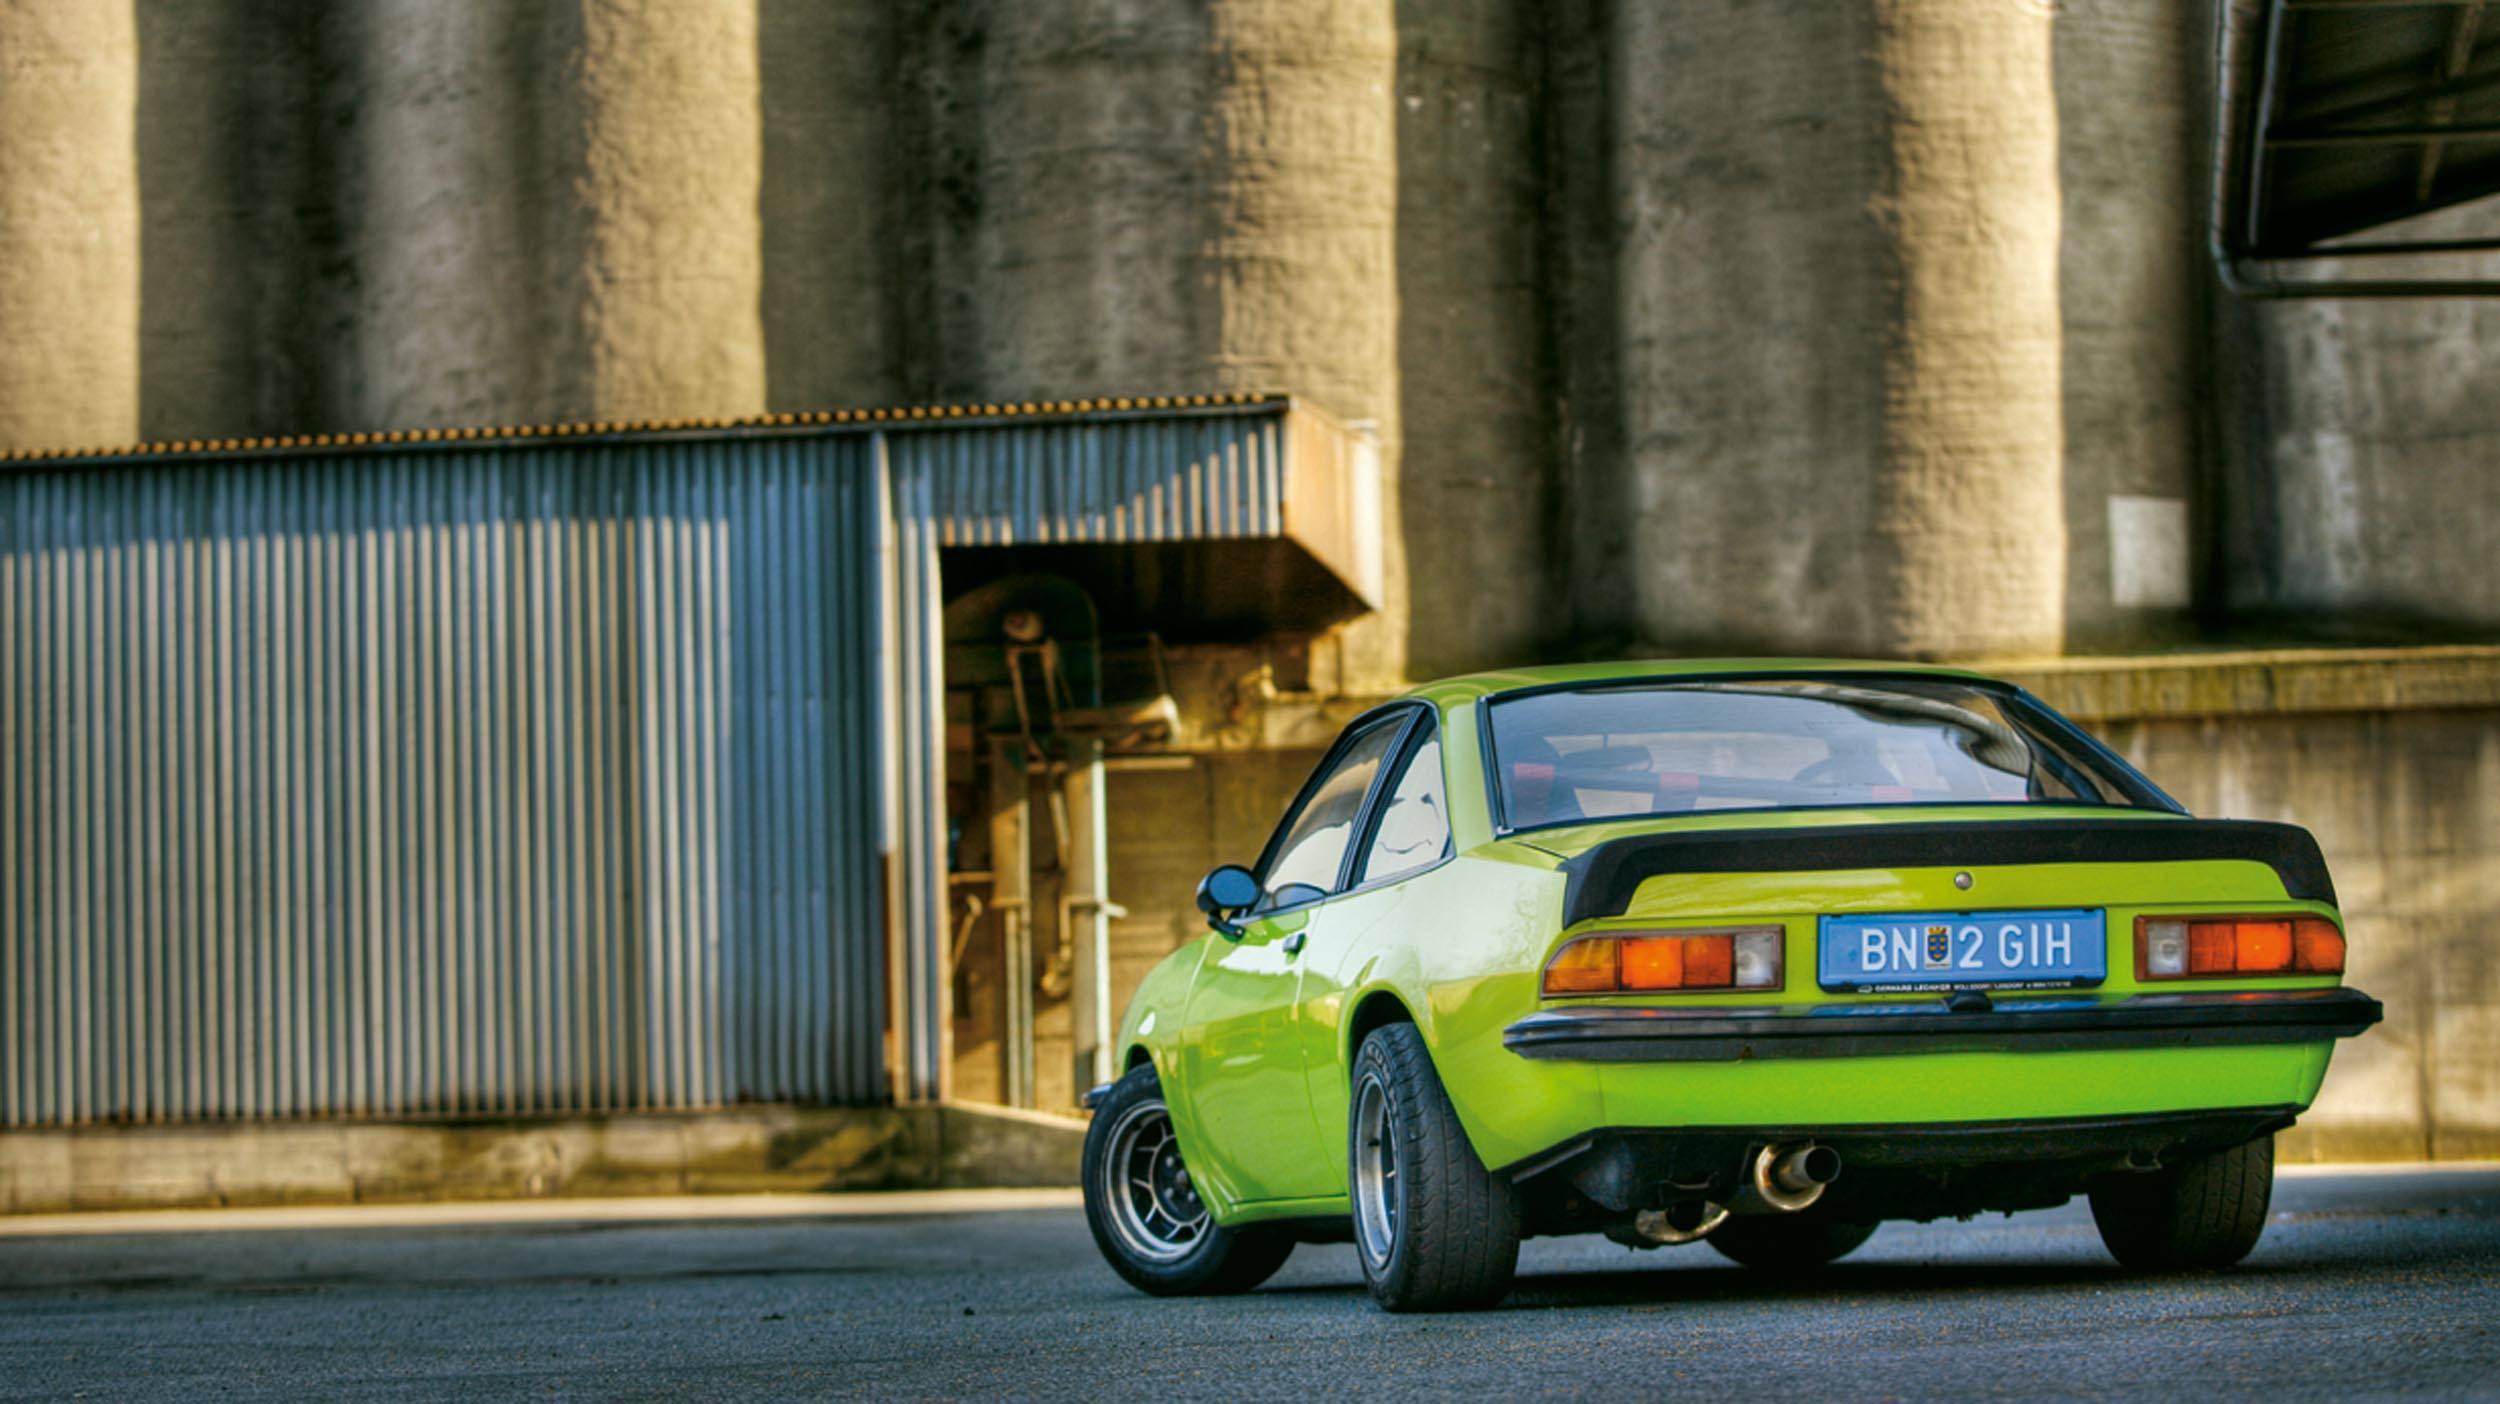 Opel Manta Bild des Tages